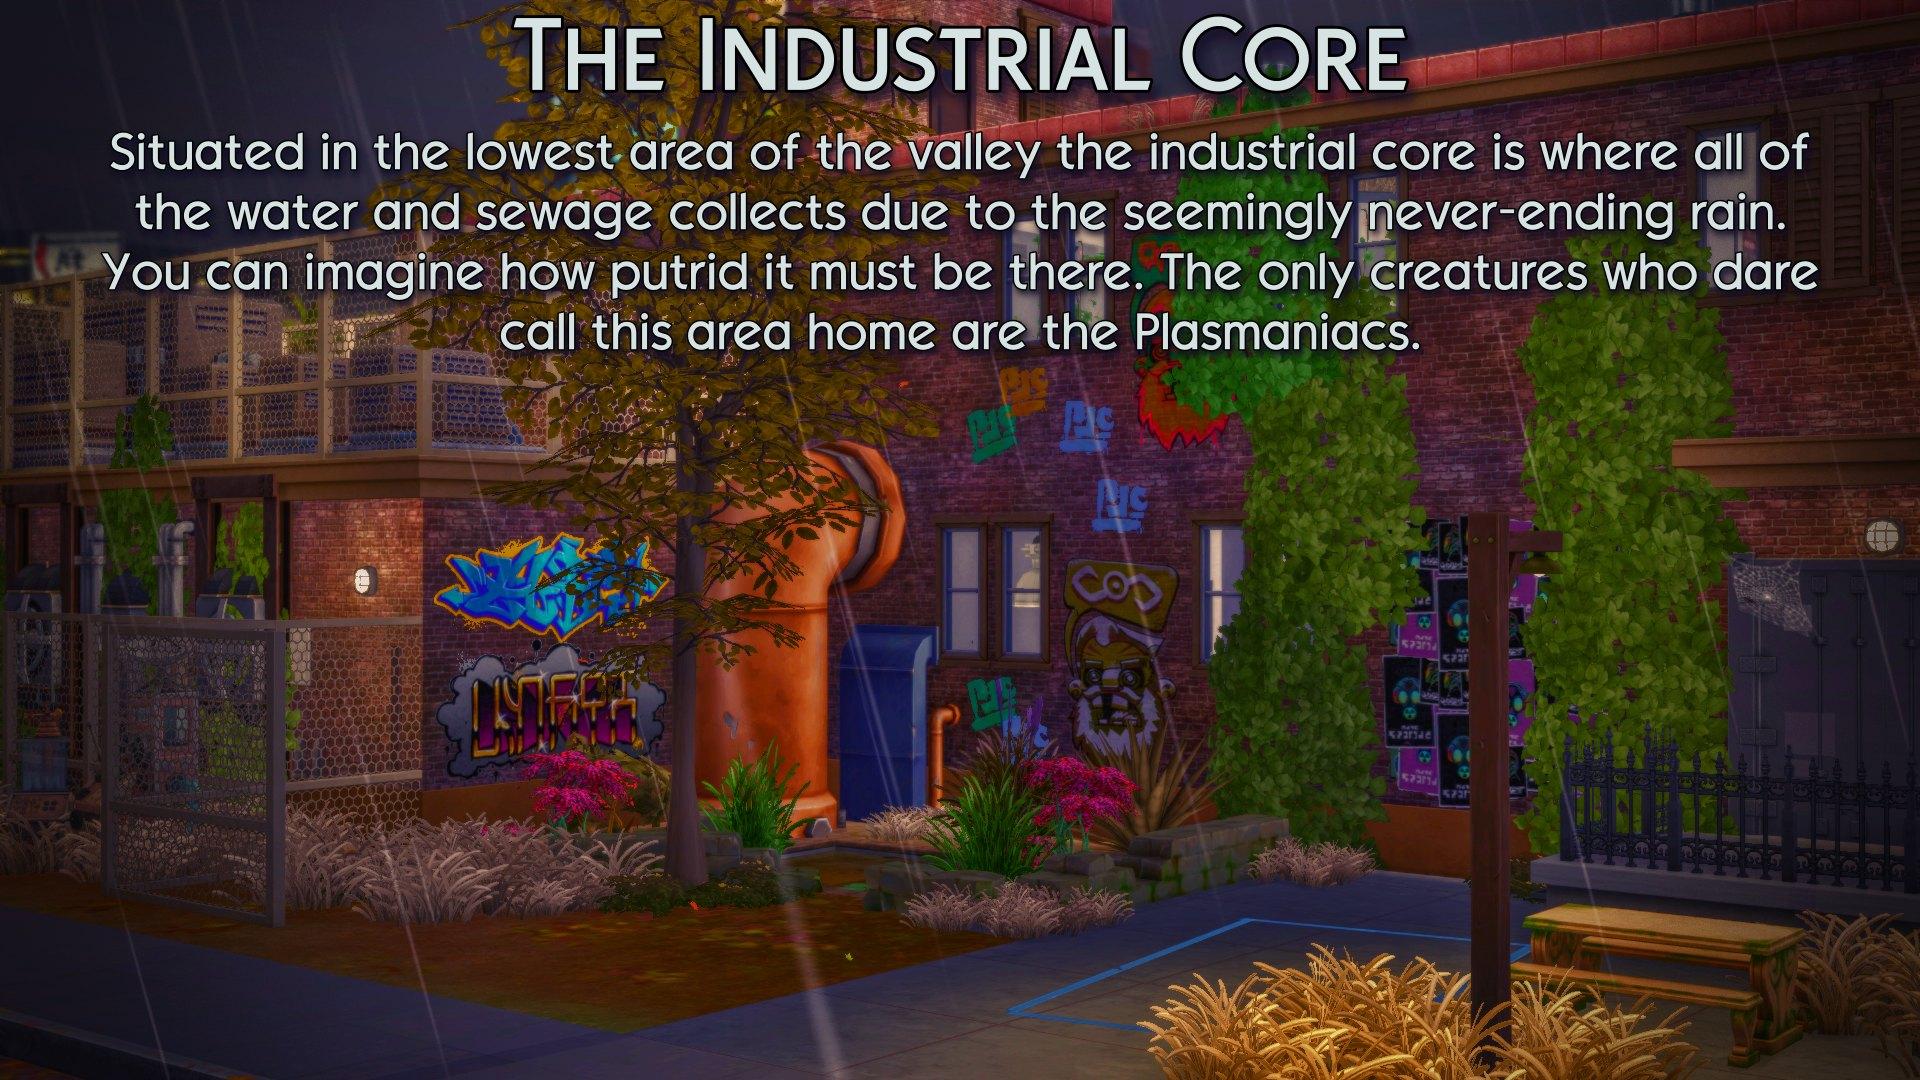 3 Industrial Core info